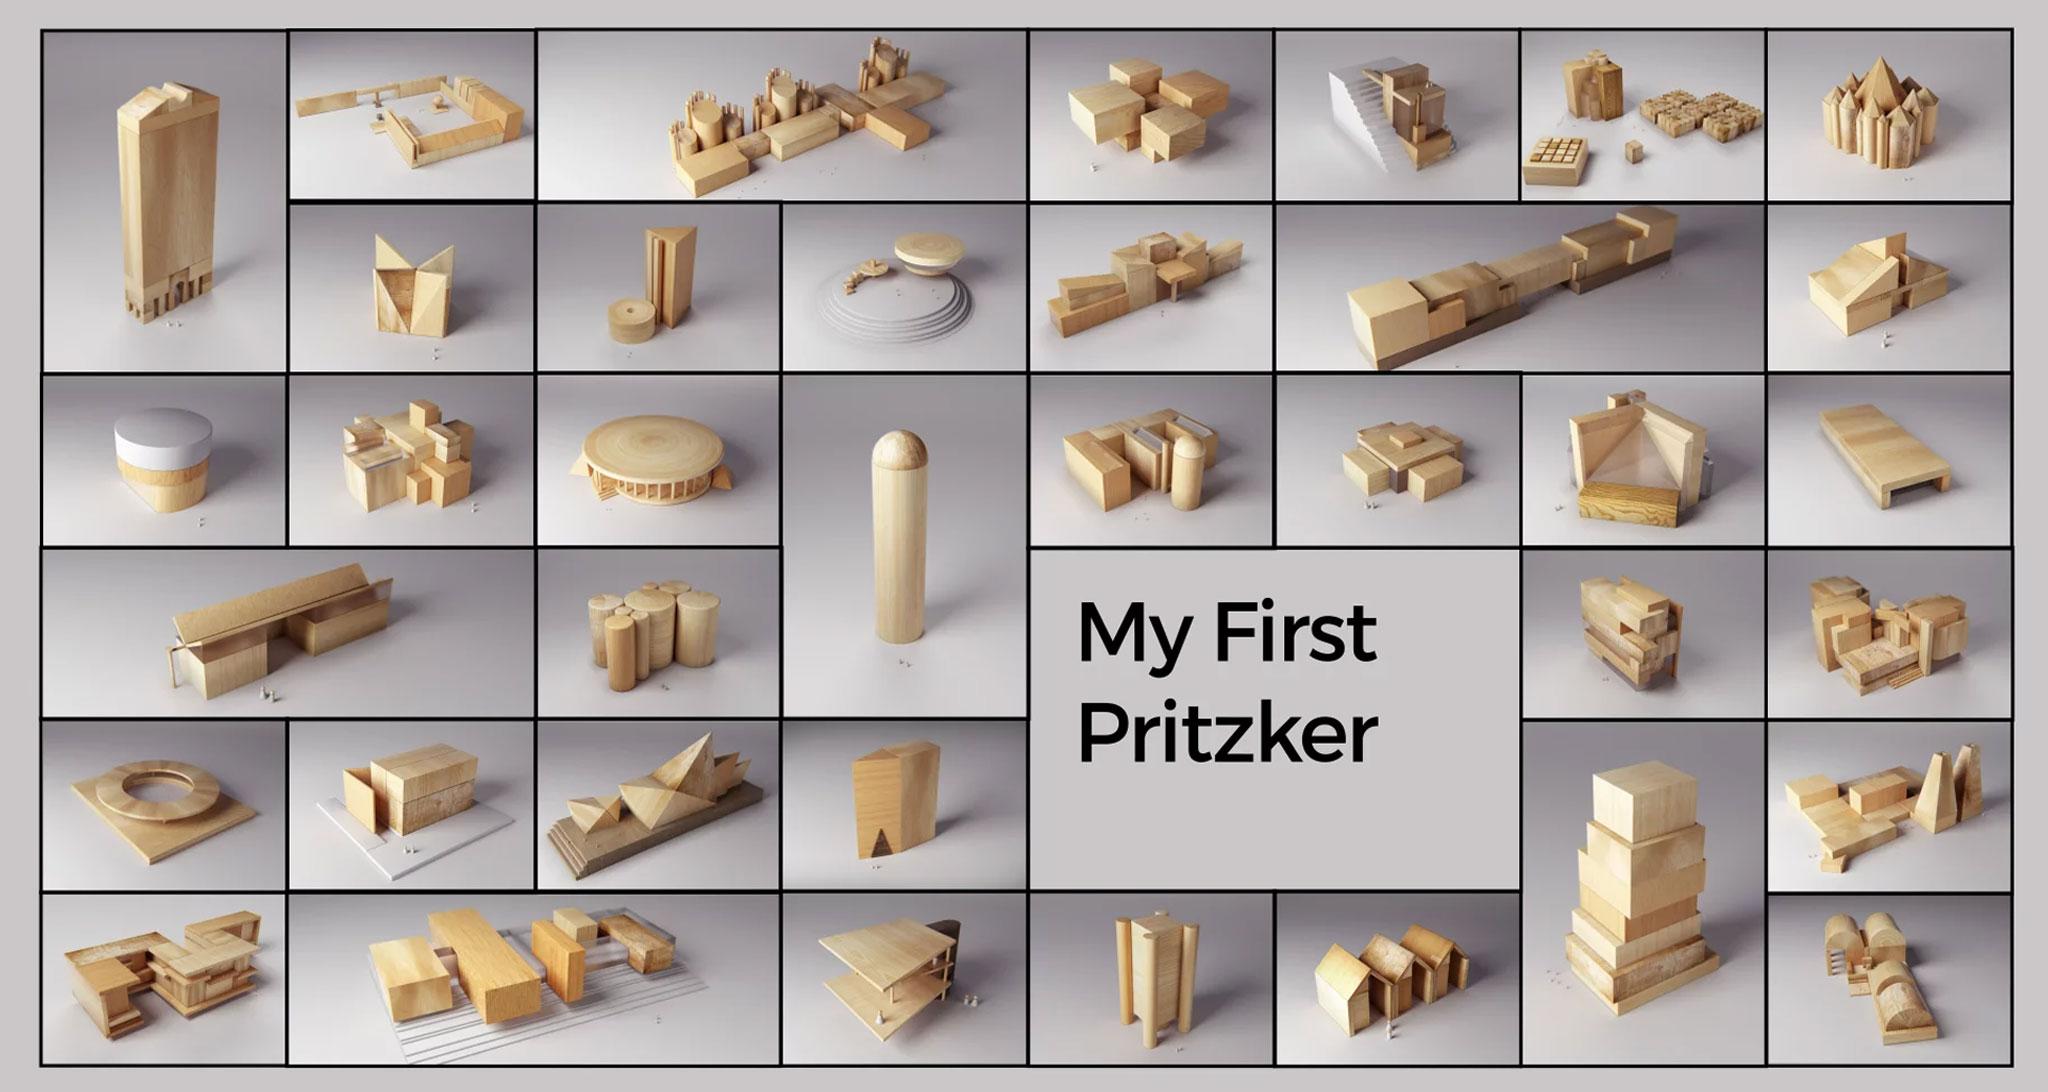 My first Pritzker by Andrea Stinga. Courtesy of Andrea Stinga